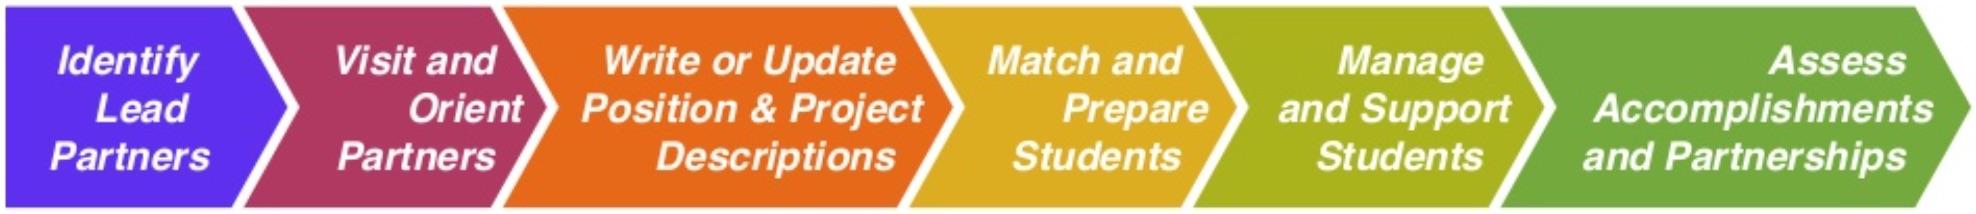 partnership_process.jpg